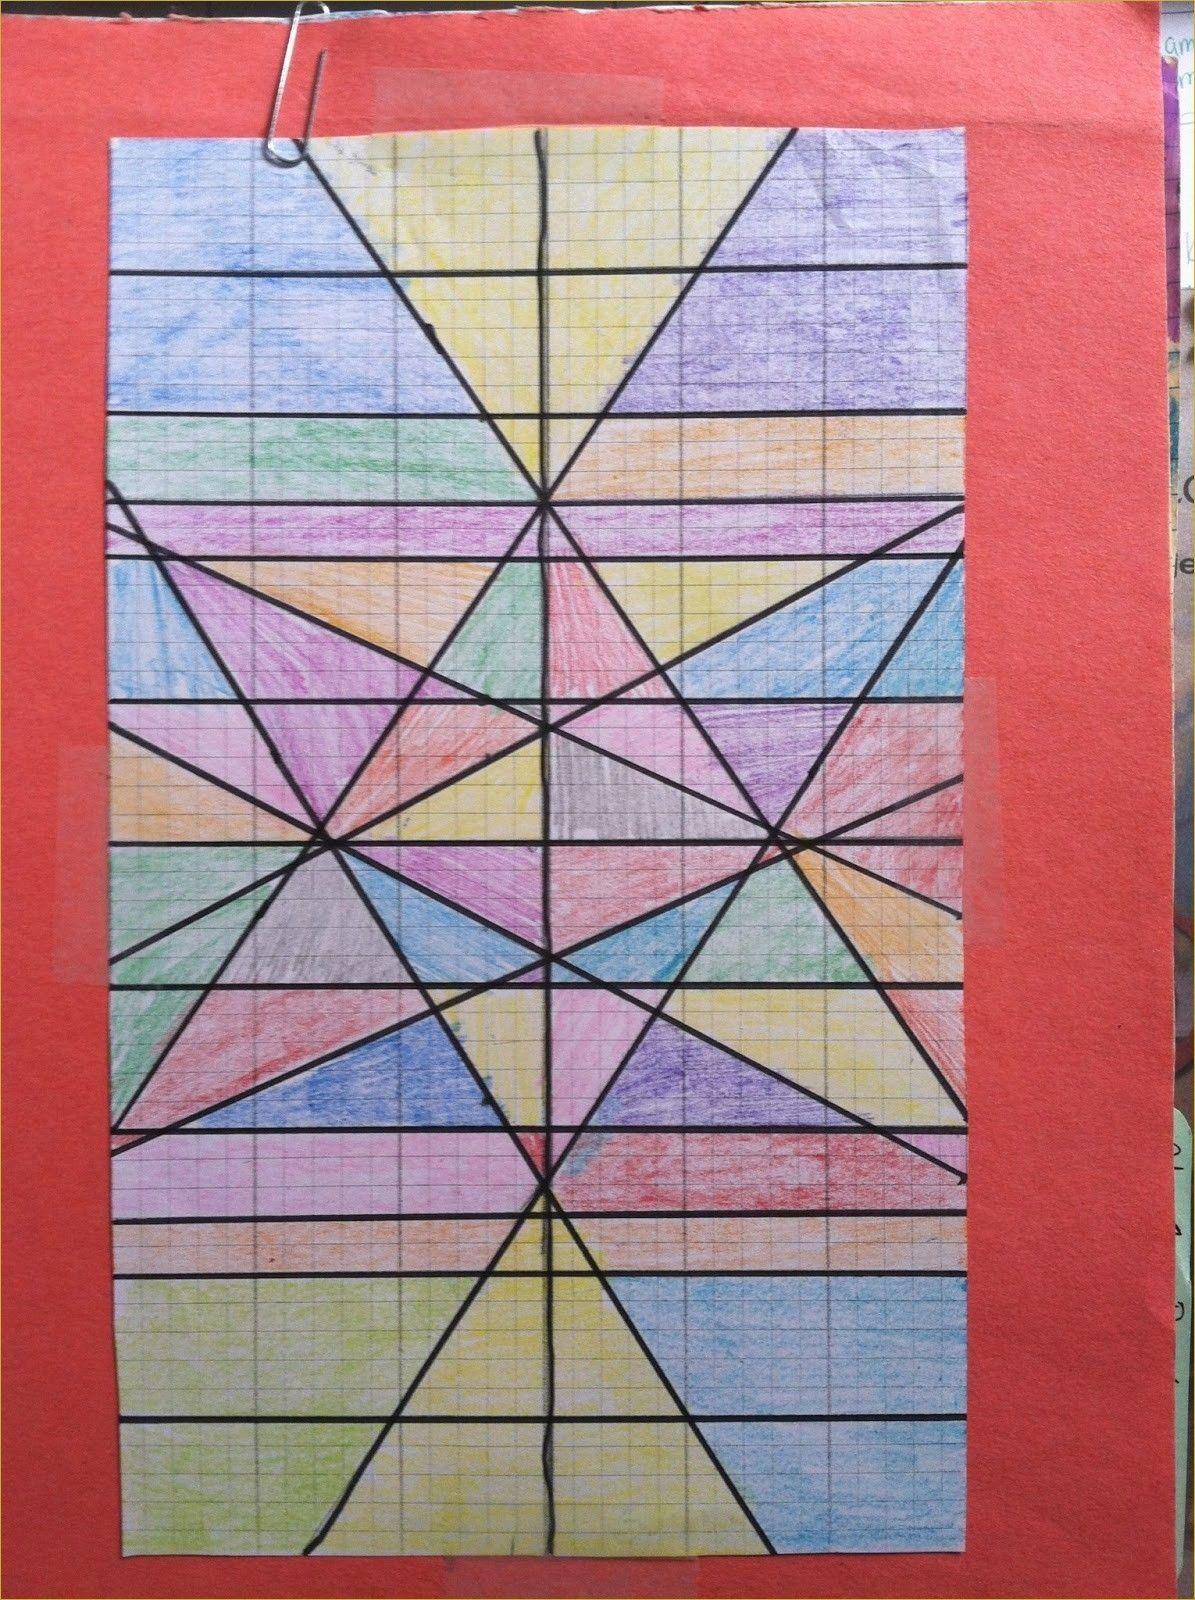 Stained Glass Blueprints Math Worksheet Raymond S Run